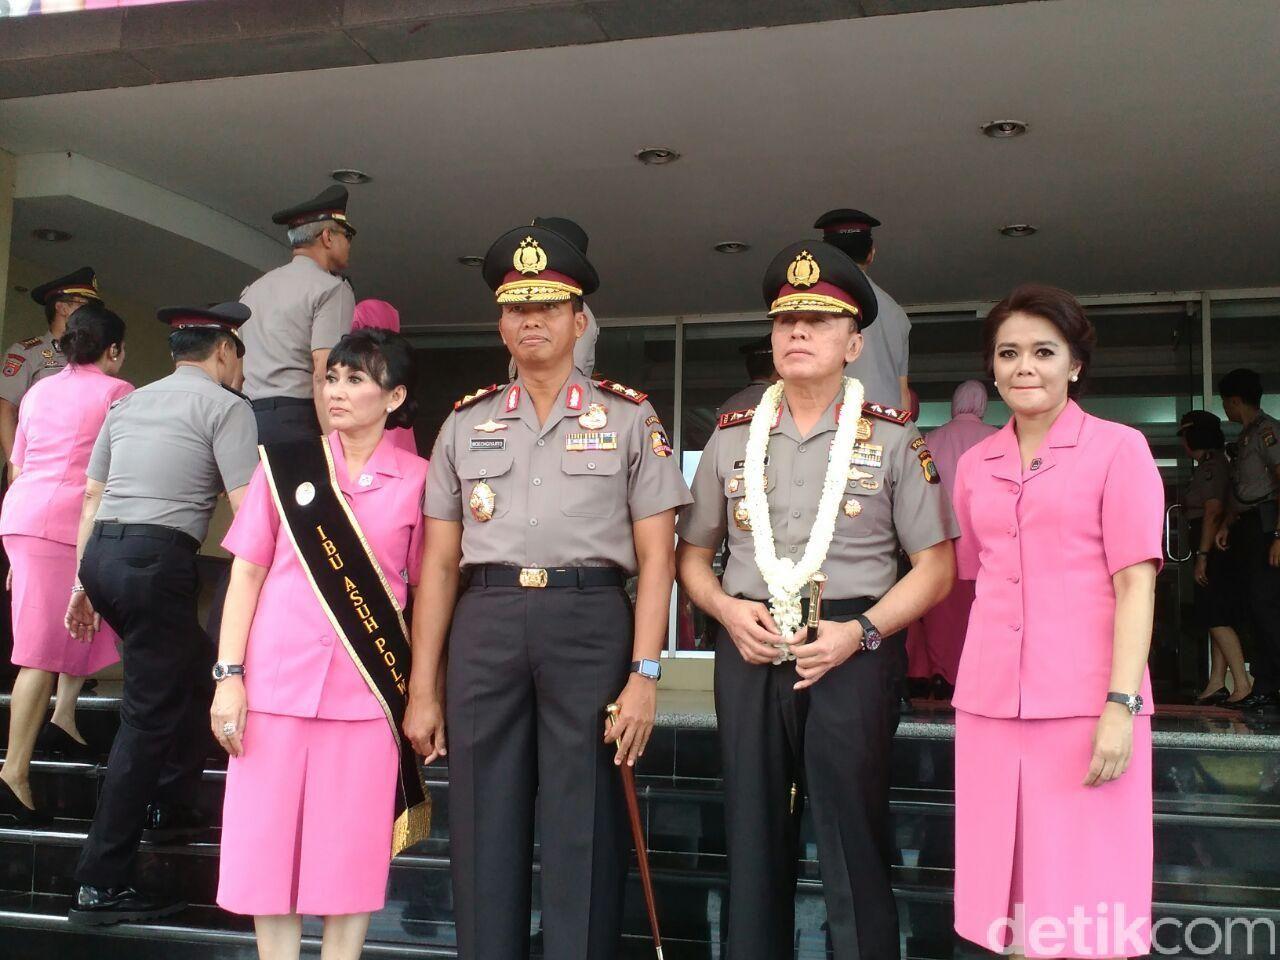 Irjen Pol Moechgiyarto dan istri serta Irjen M Iriawan dan istri foto bersama (Mei Amelia/detikcom)